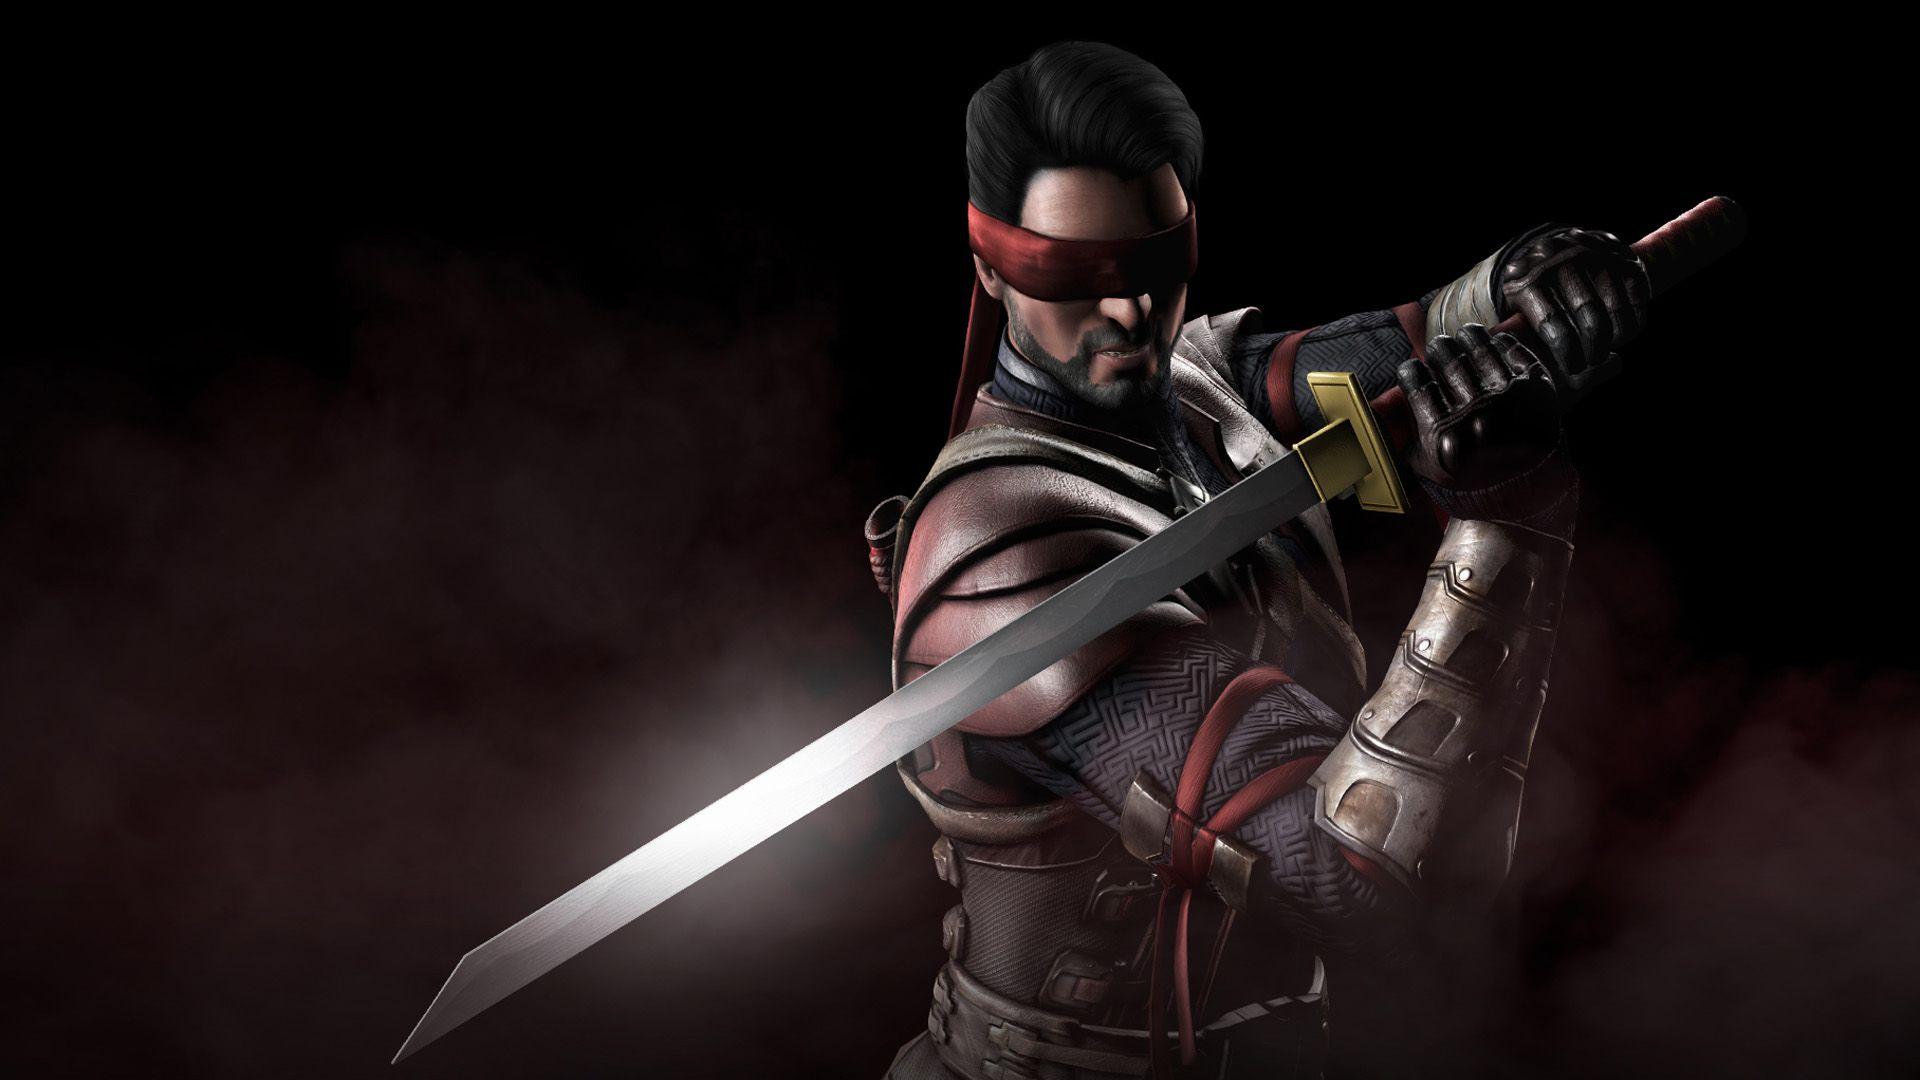 Mortal Kombat X Sword Man Wallpaper HD Nero Pinterest